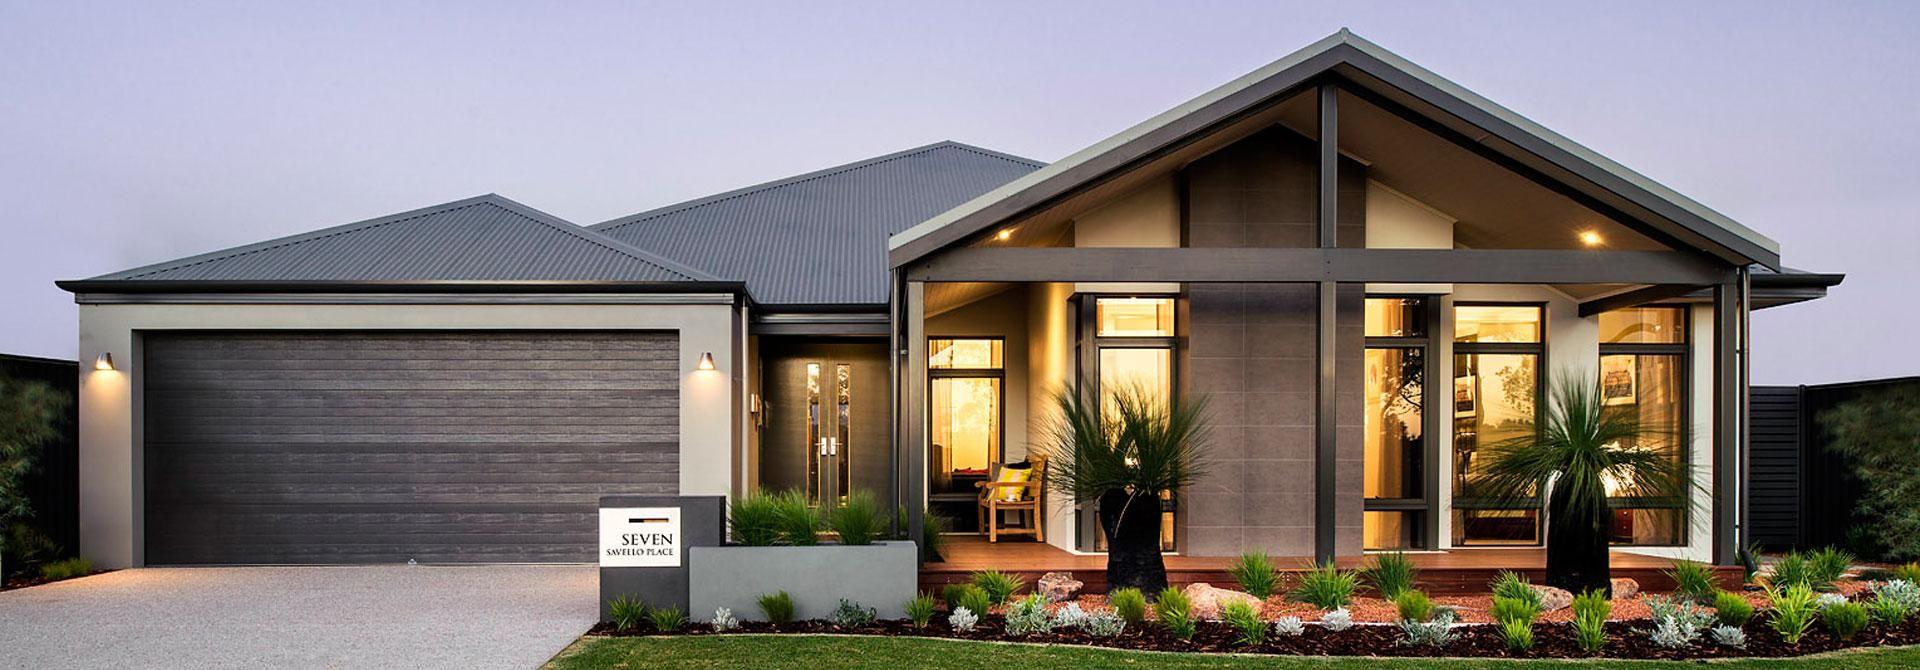 New Home Designs Perth Goulburn I Dale Alcock Homes